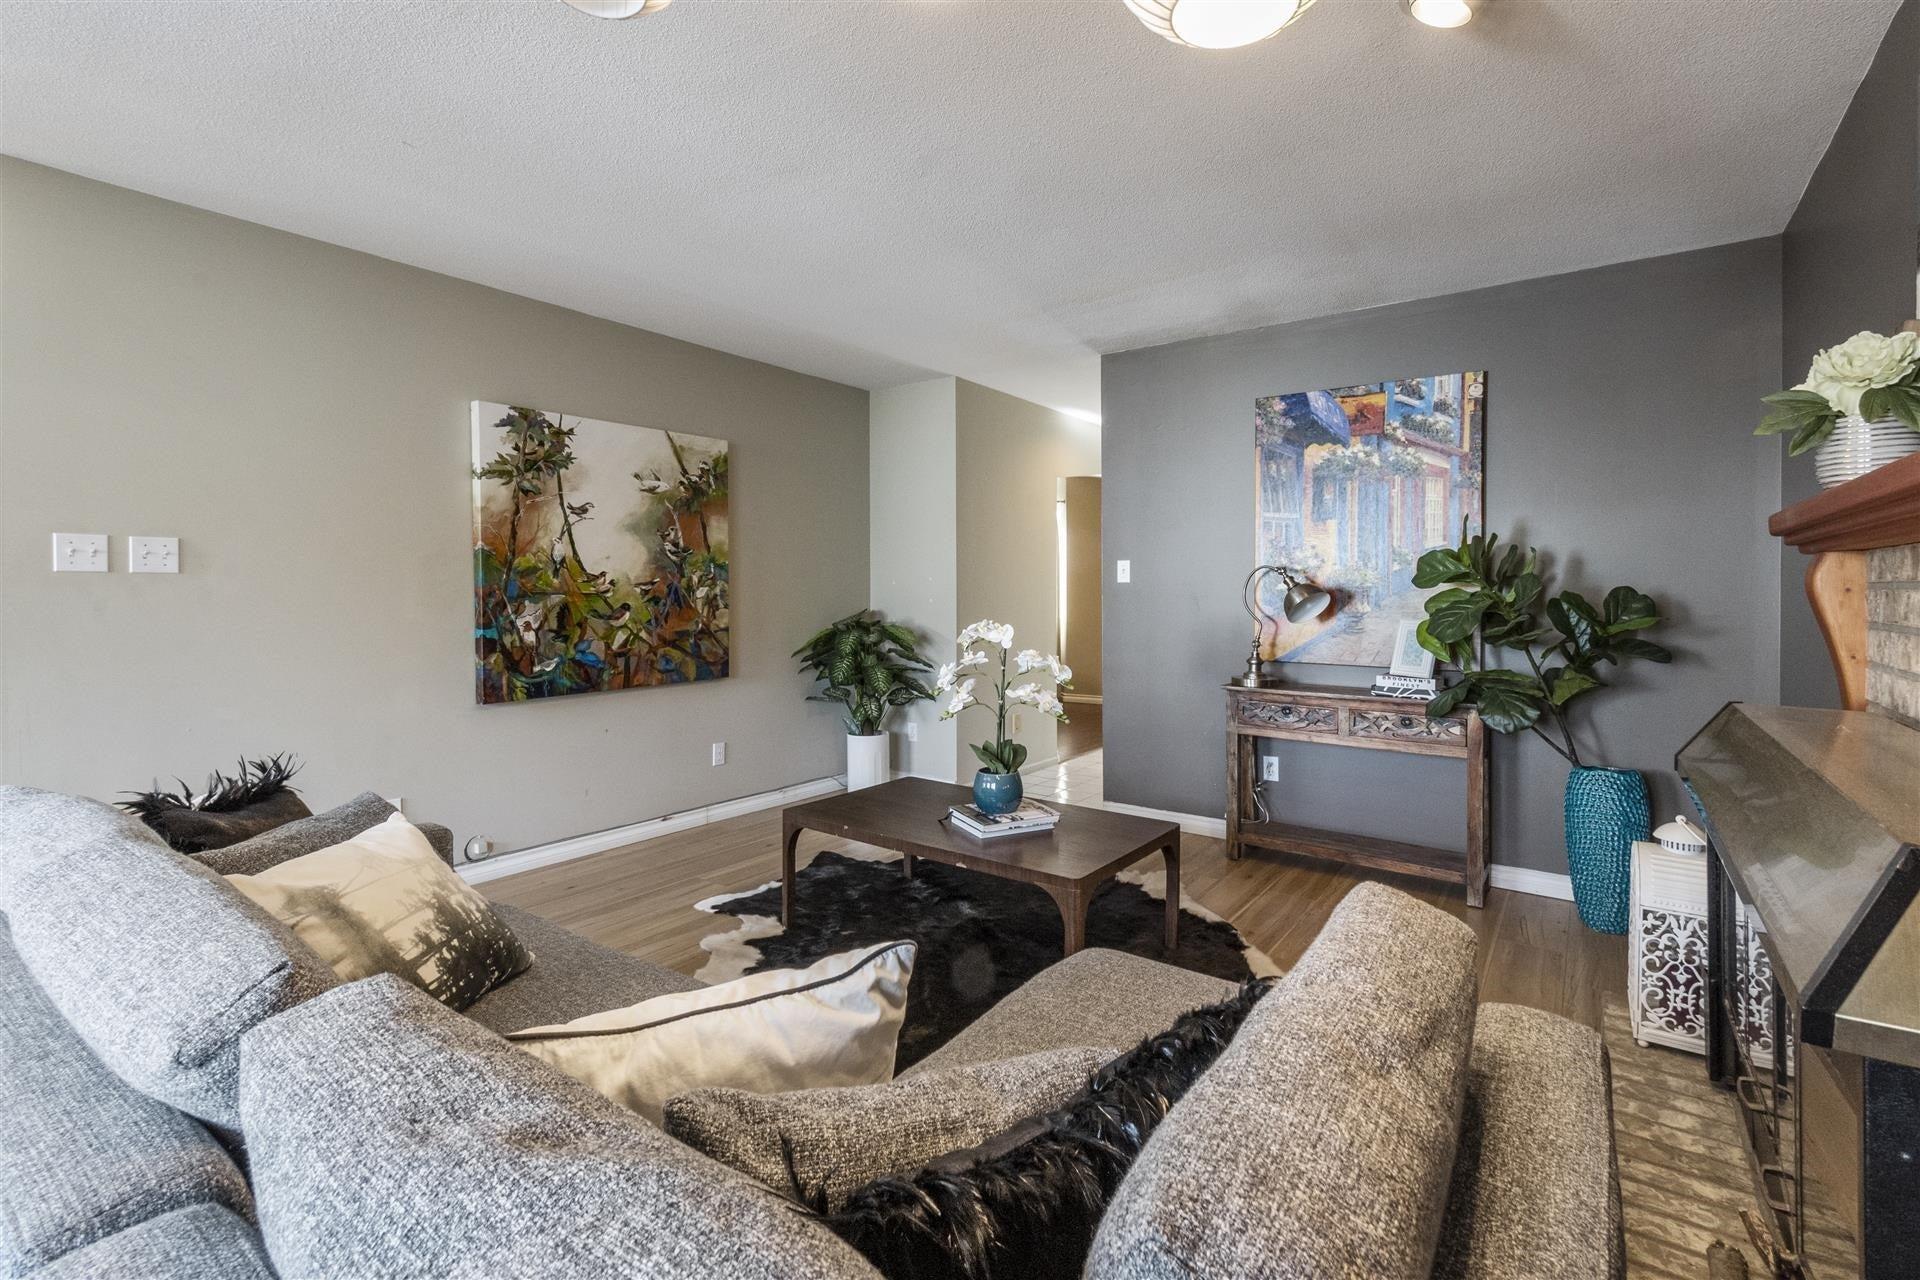 3631 GEORGIA STREET - Steveston Village House/Single Family for sale, 3 Bedrooms (R2623894) - #10